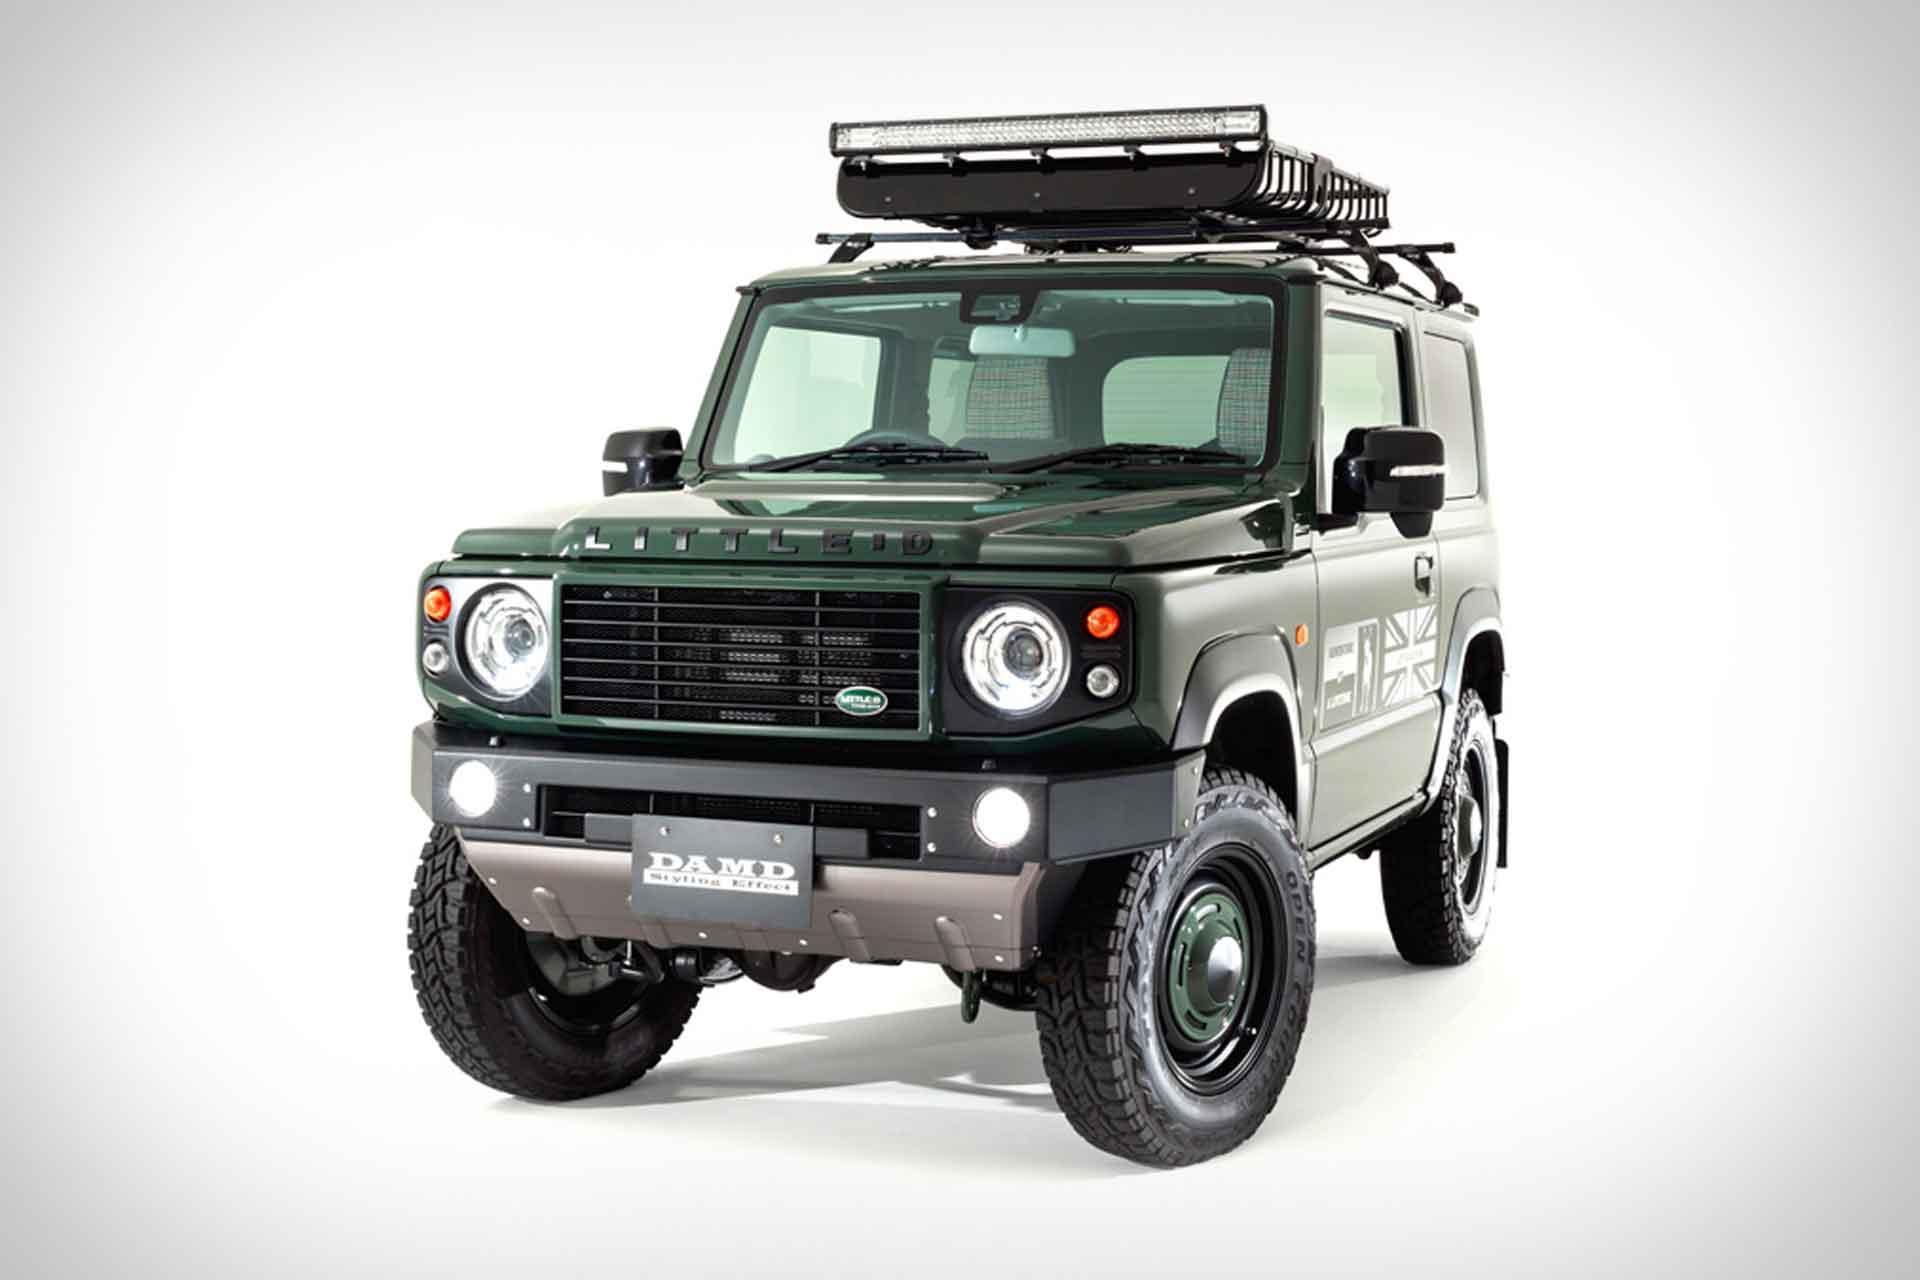 DAMD Suzuki Jimny Defender Body Kit